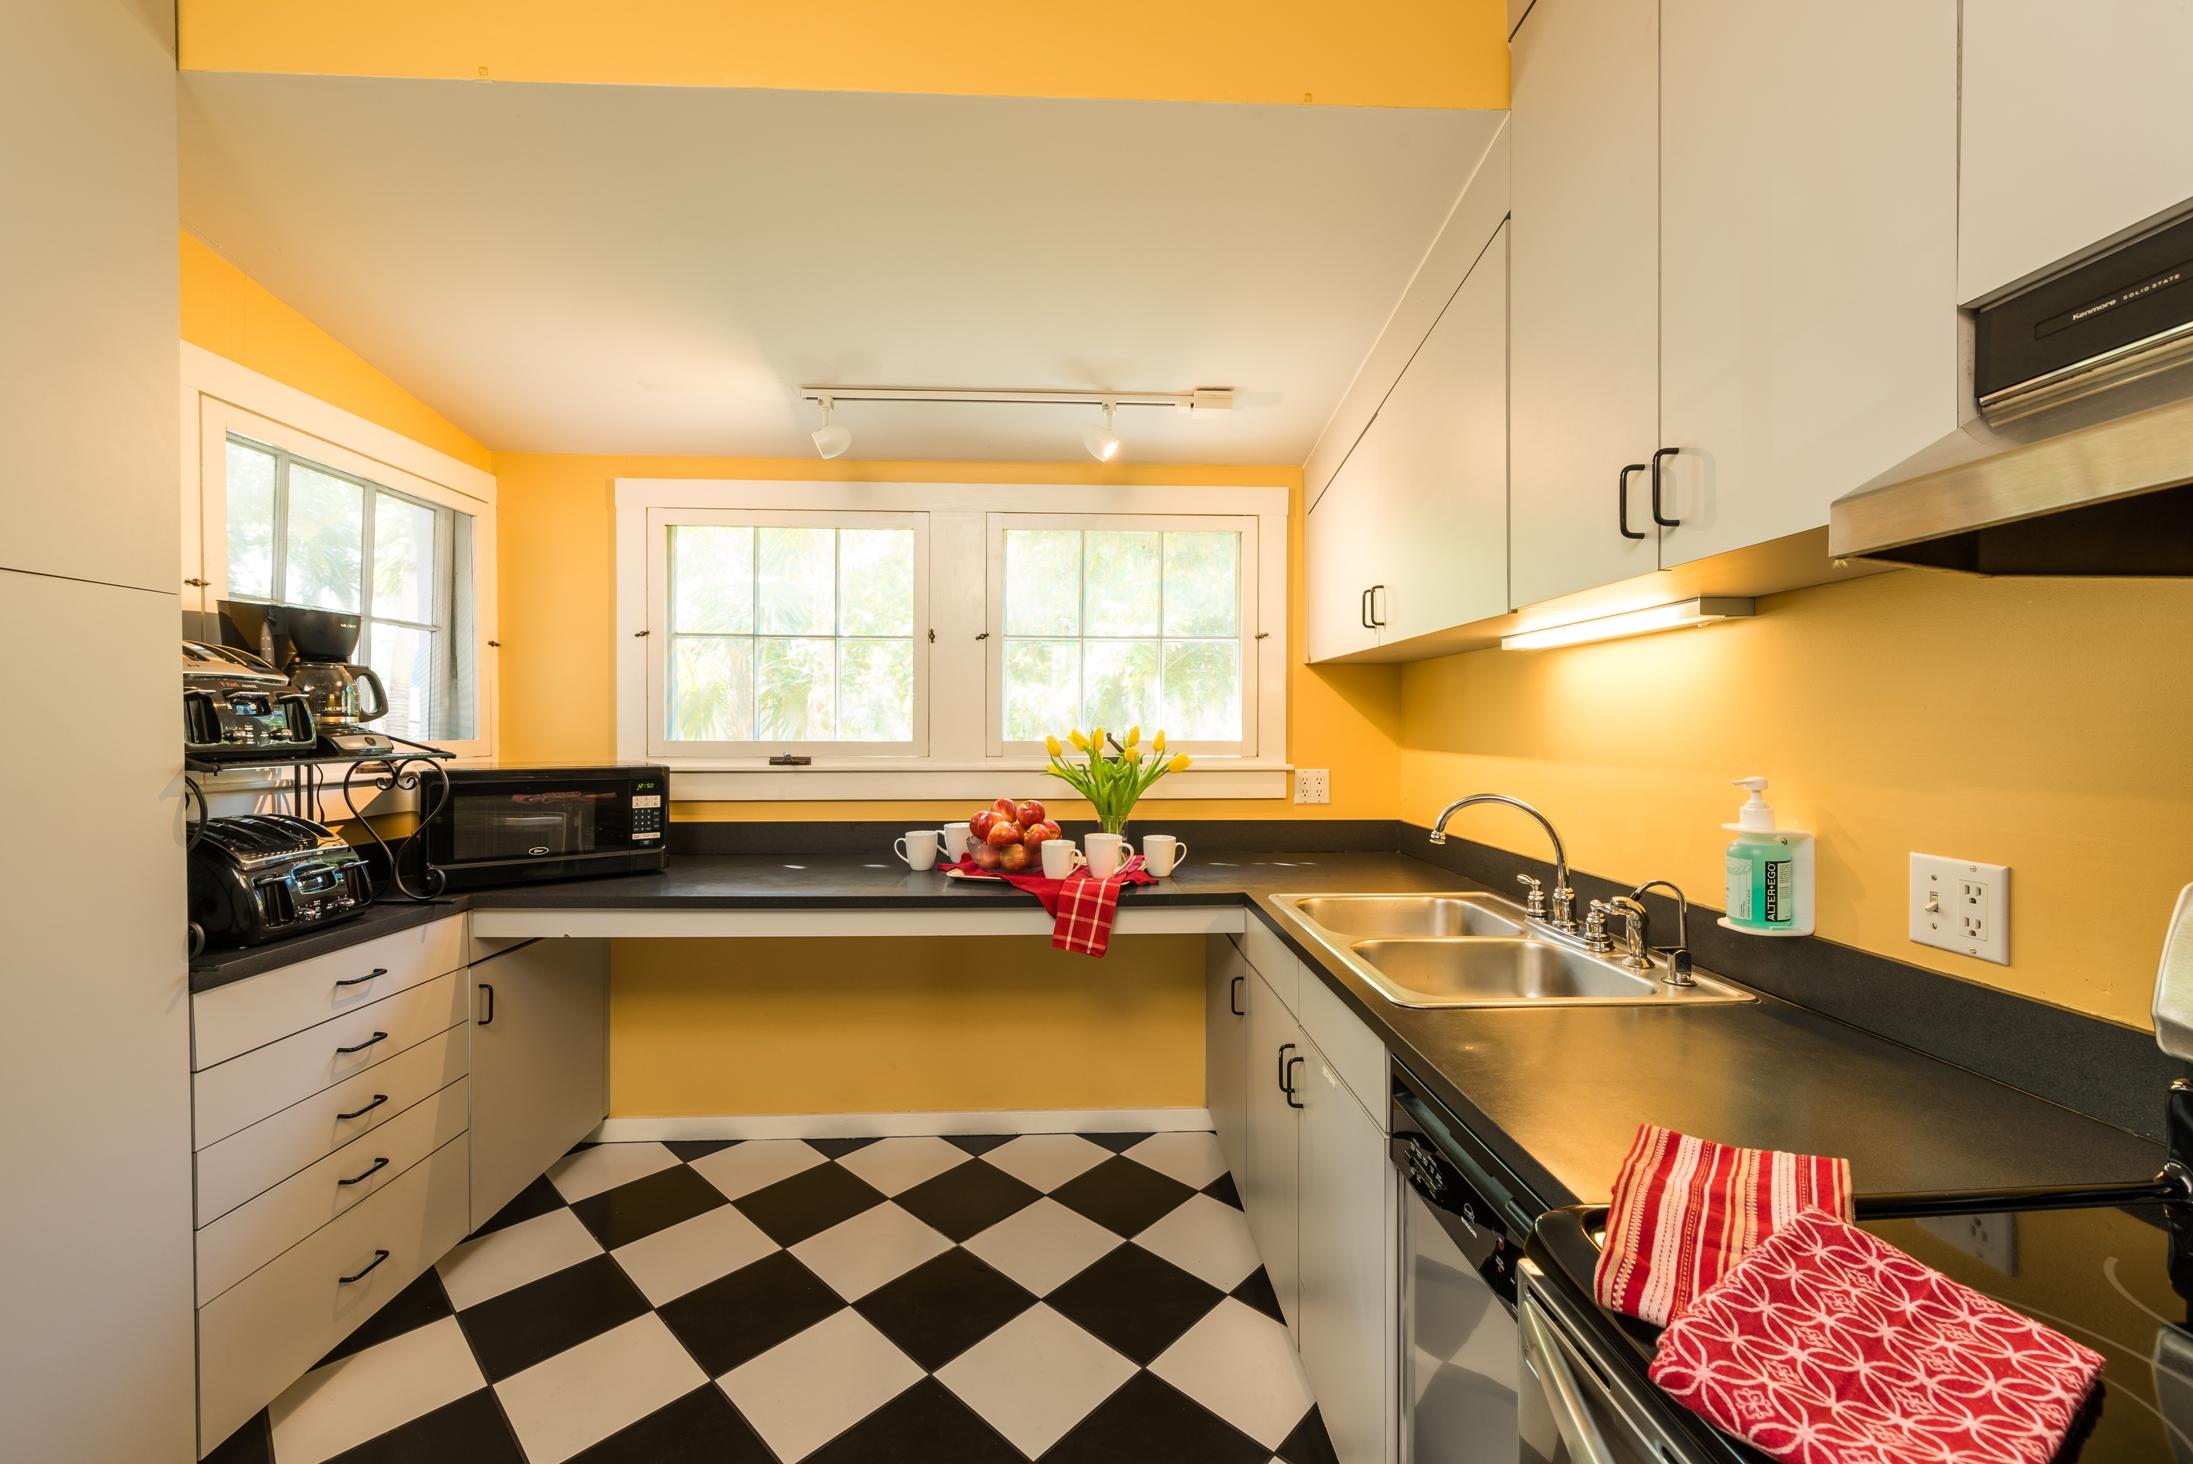 Key West Vacation Home - William Skelton House - Second Floor Kitchen